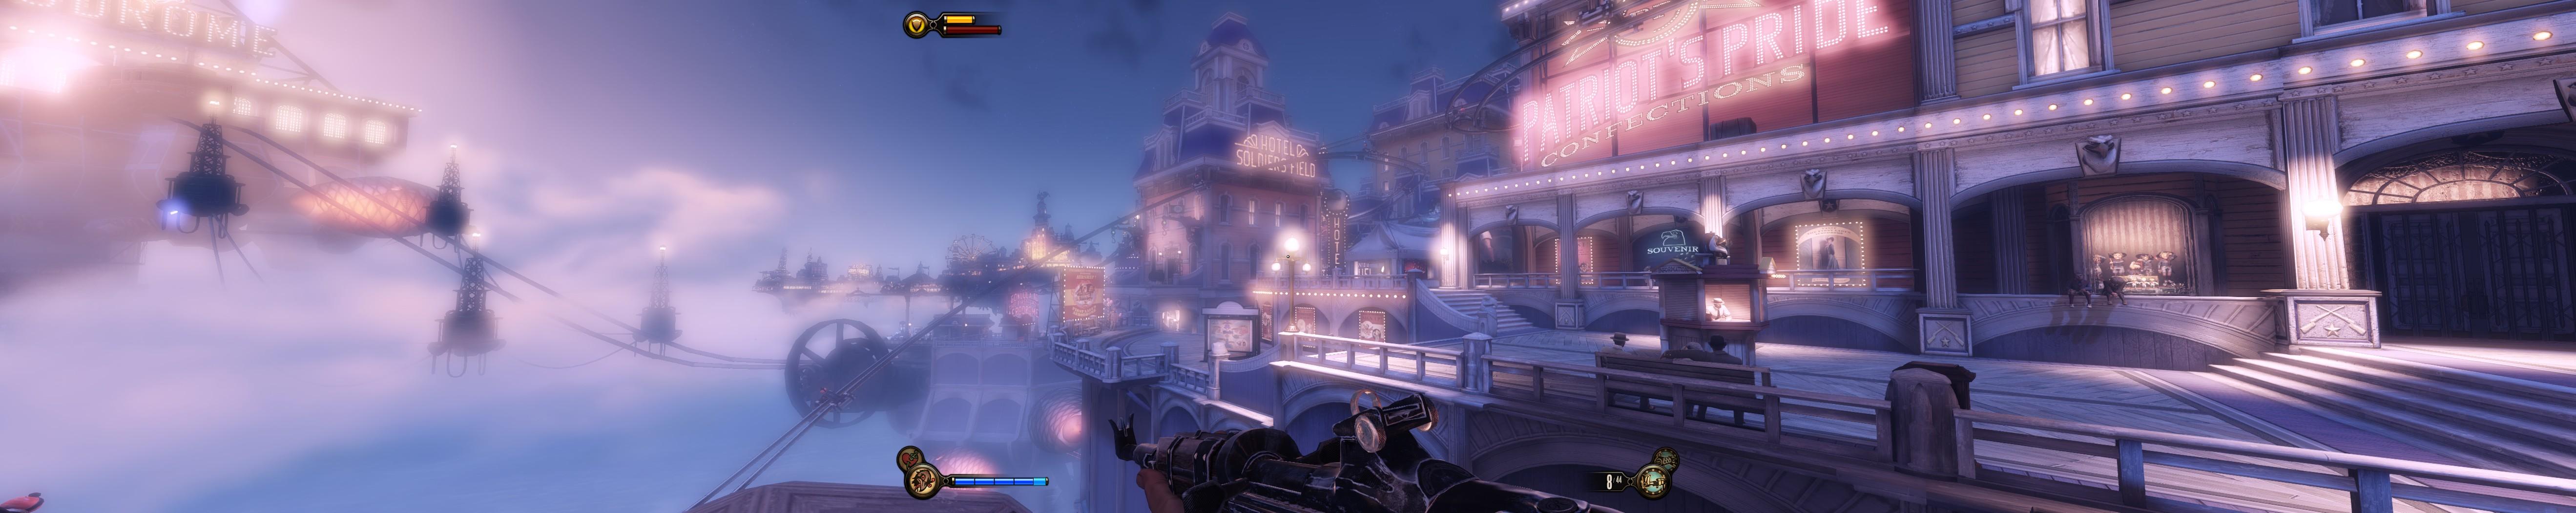 Bioshock_Infinite_2013-04-21_00038.jpg